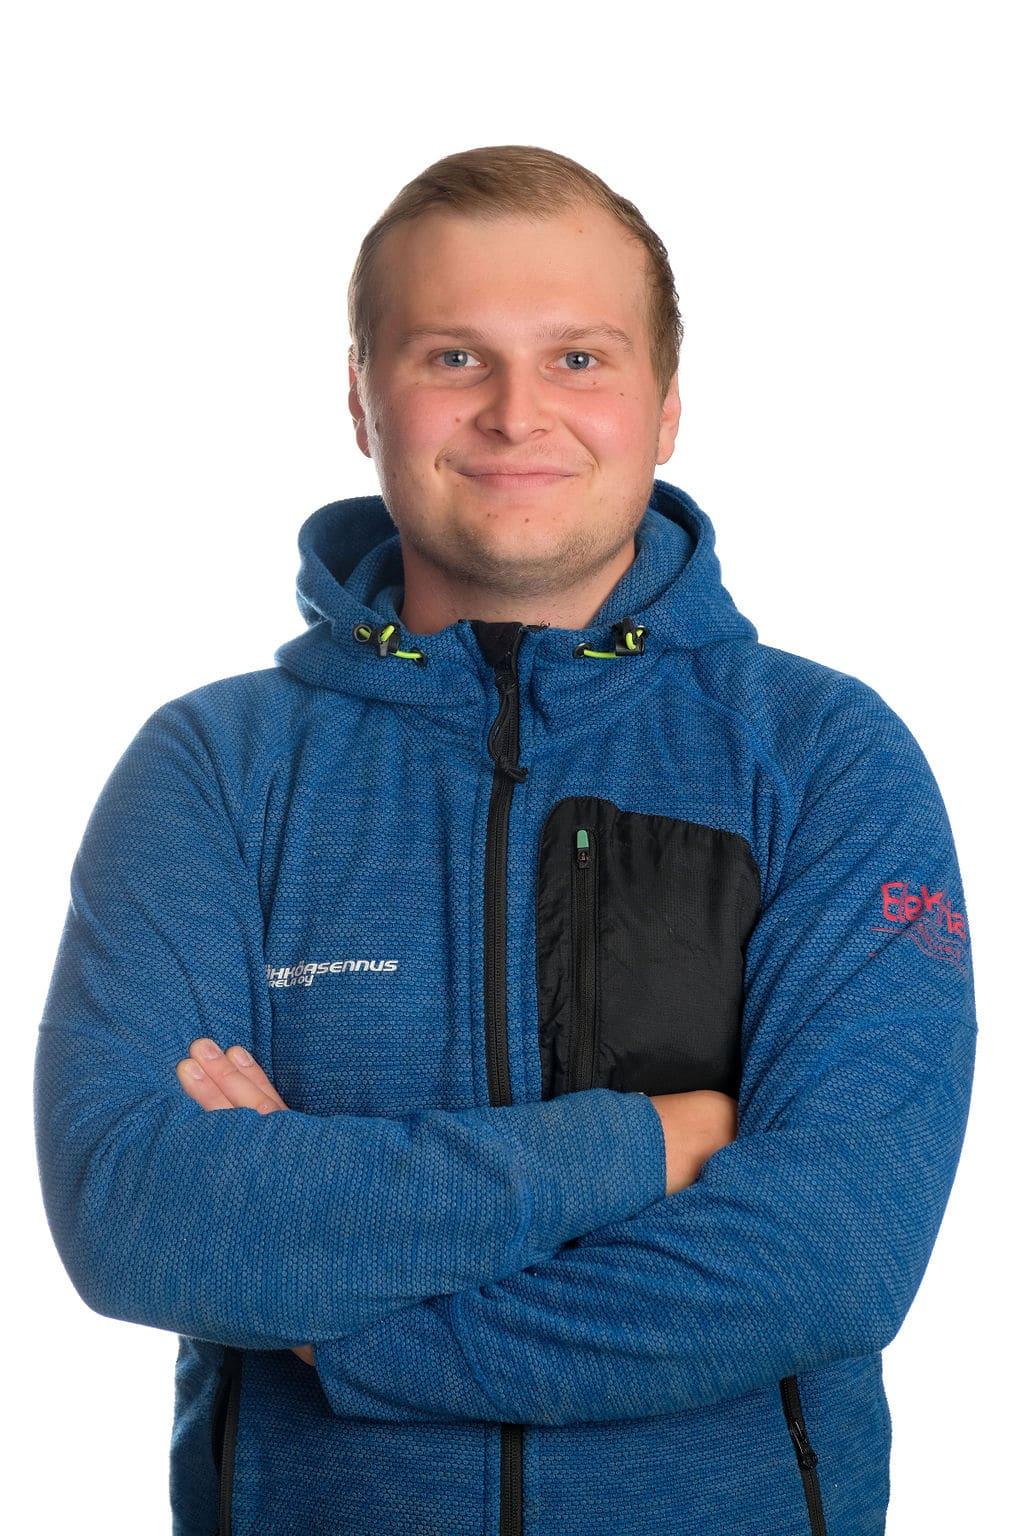 Niko Lempinen